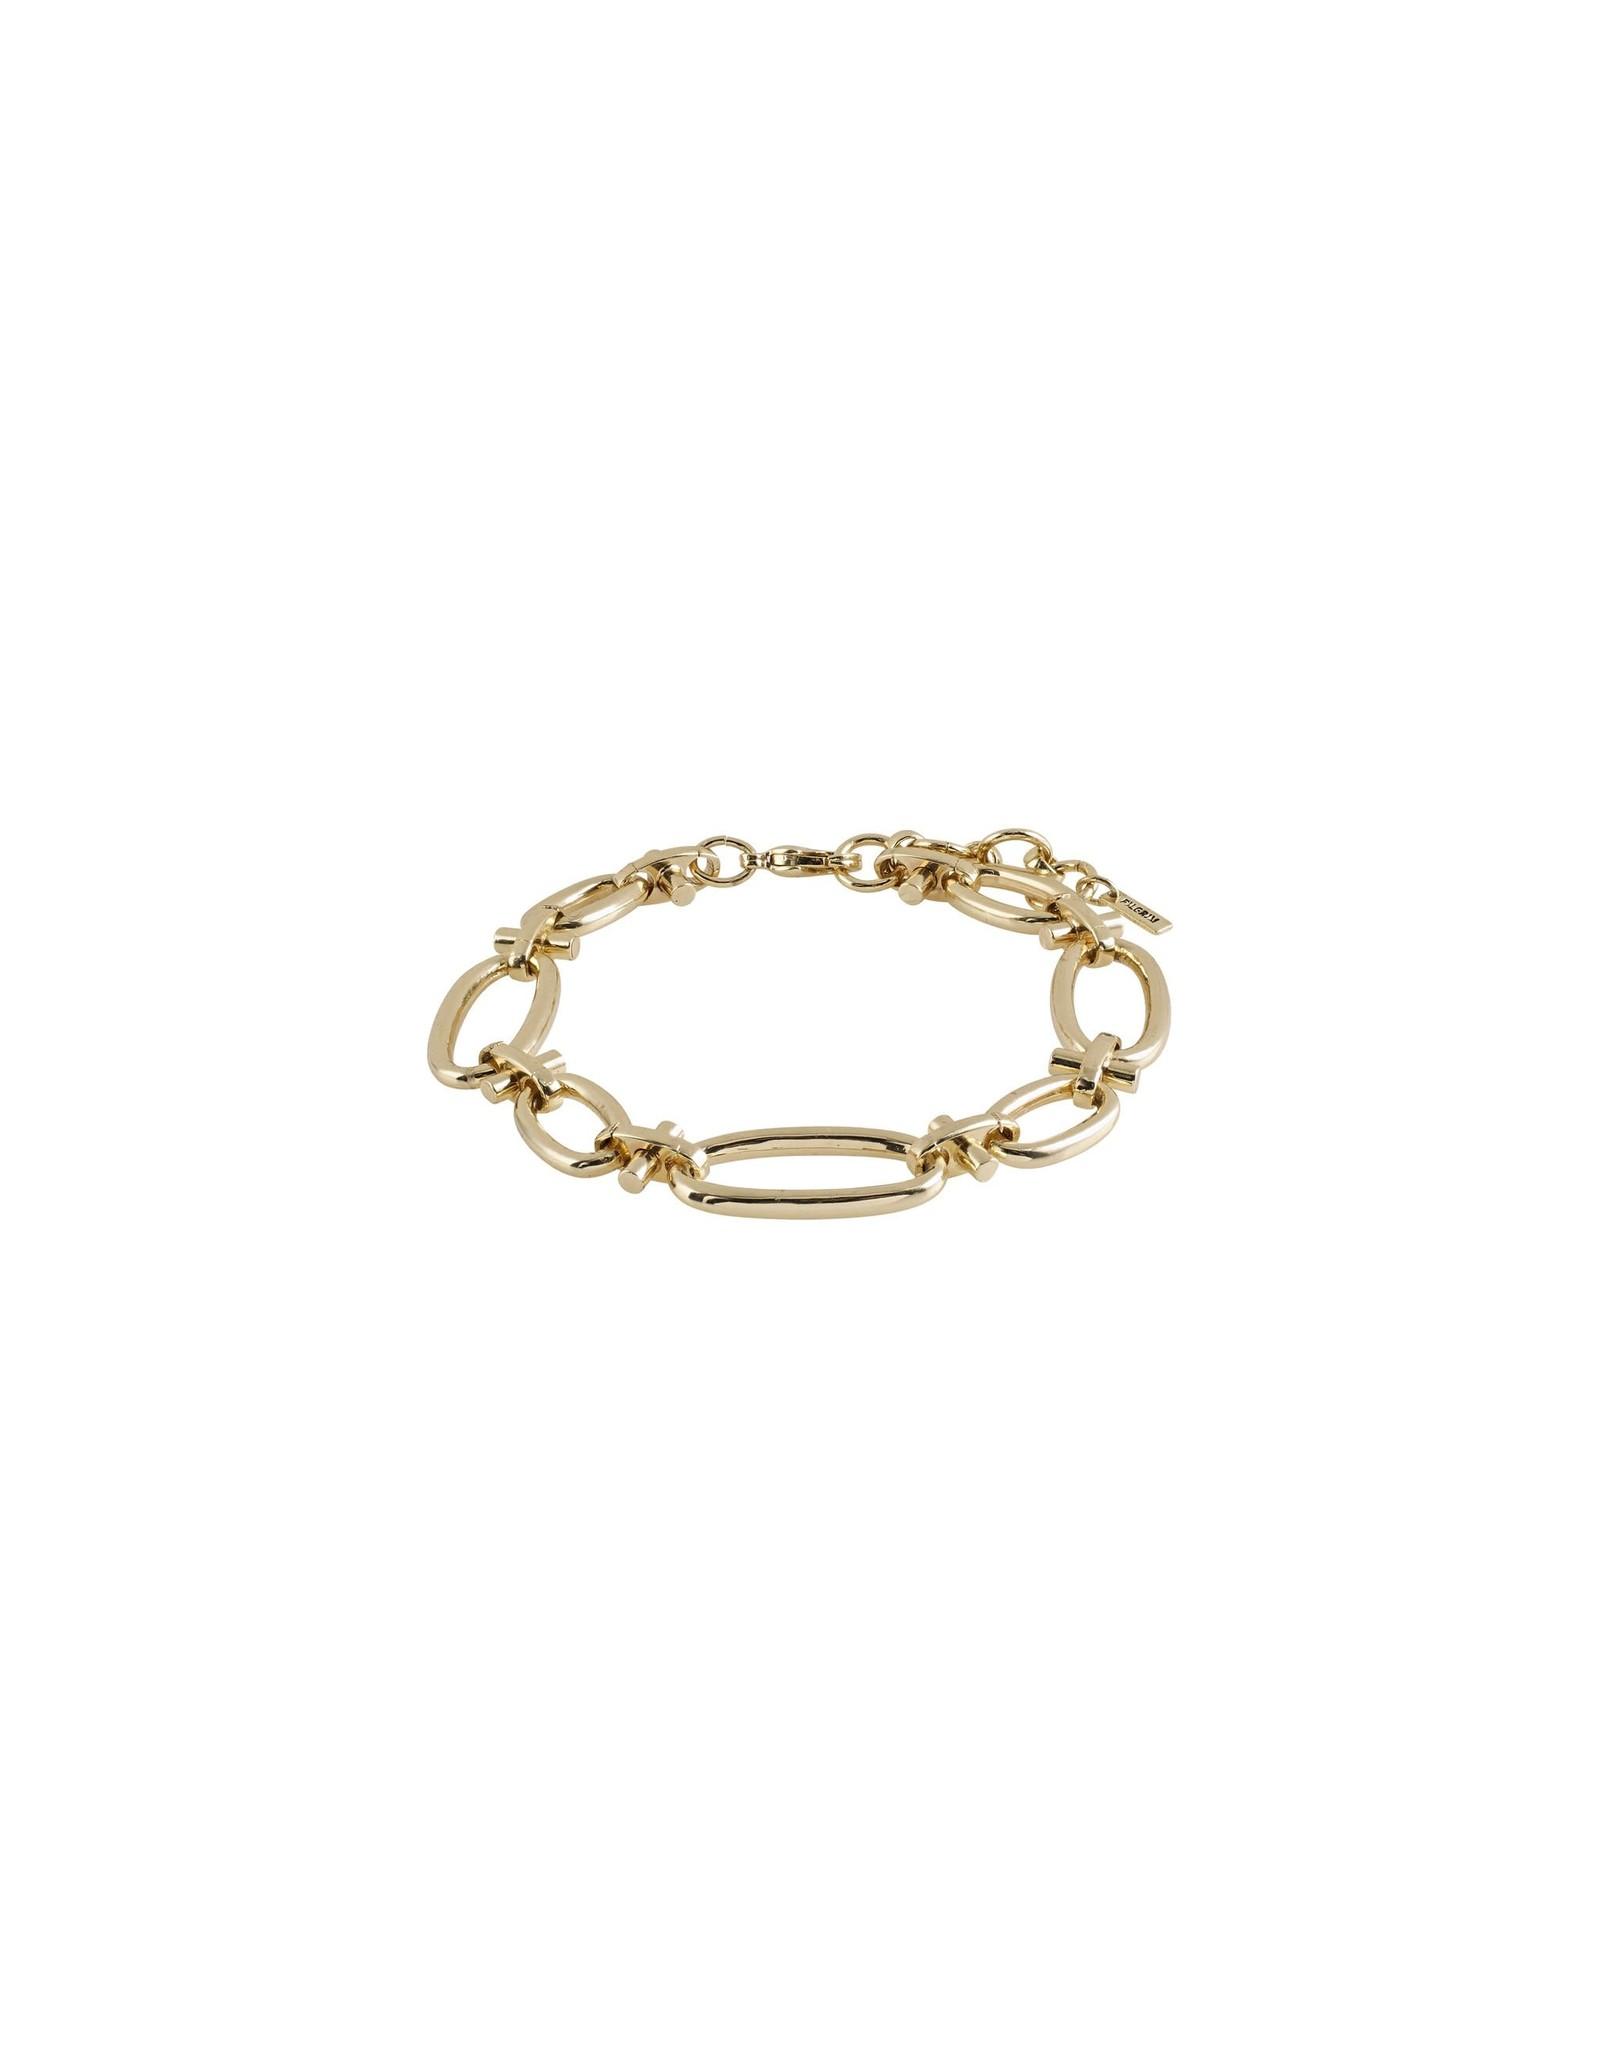 Pilgrim Pilgrim Wisdom Bracelet Gold Plated